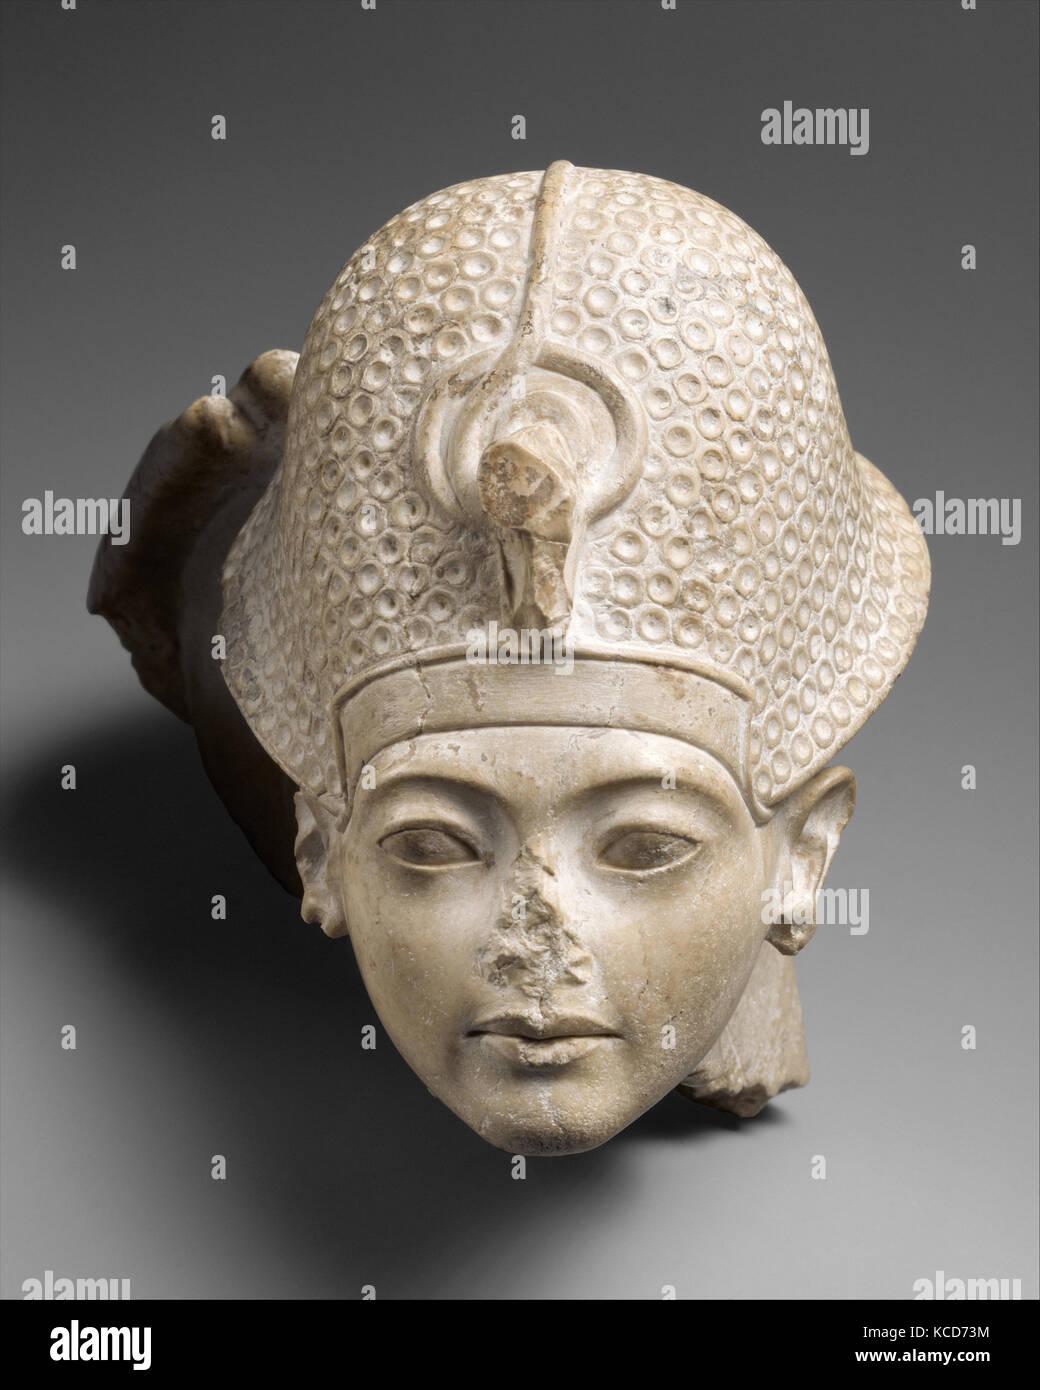 Head of Tutankhamun, New Kingdom, Amarna Period, Dynasty 18, ca. 1336–1327 B.C., From Egypt, Indurated Limestone, - Stock Image